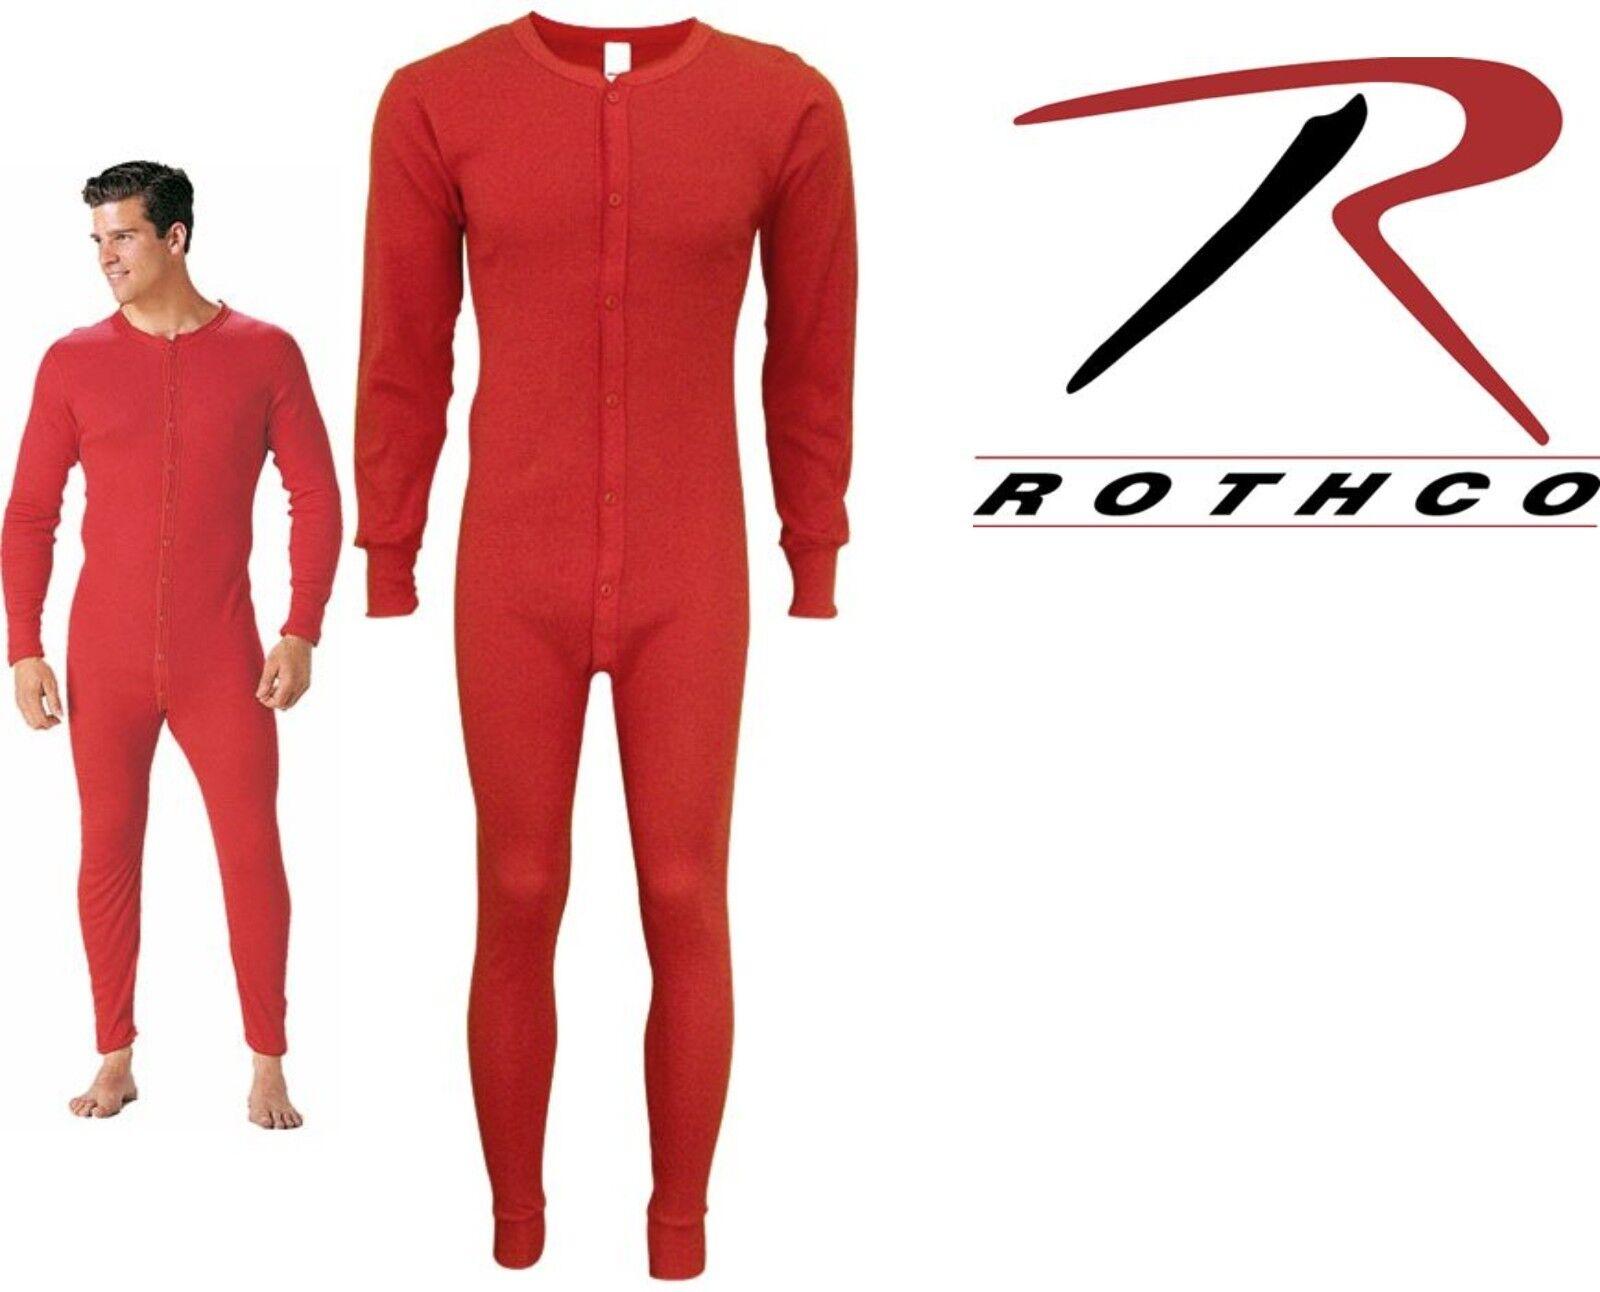 winter classic men 39 s long johns red one piece union suit. Black Bedroom Furniture Sets. Home Design Ideas